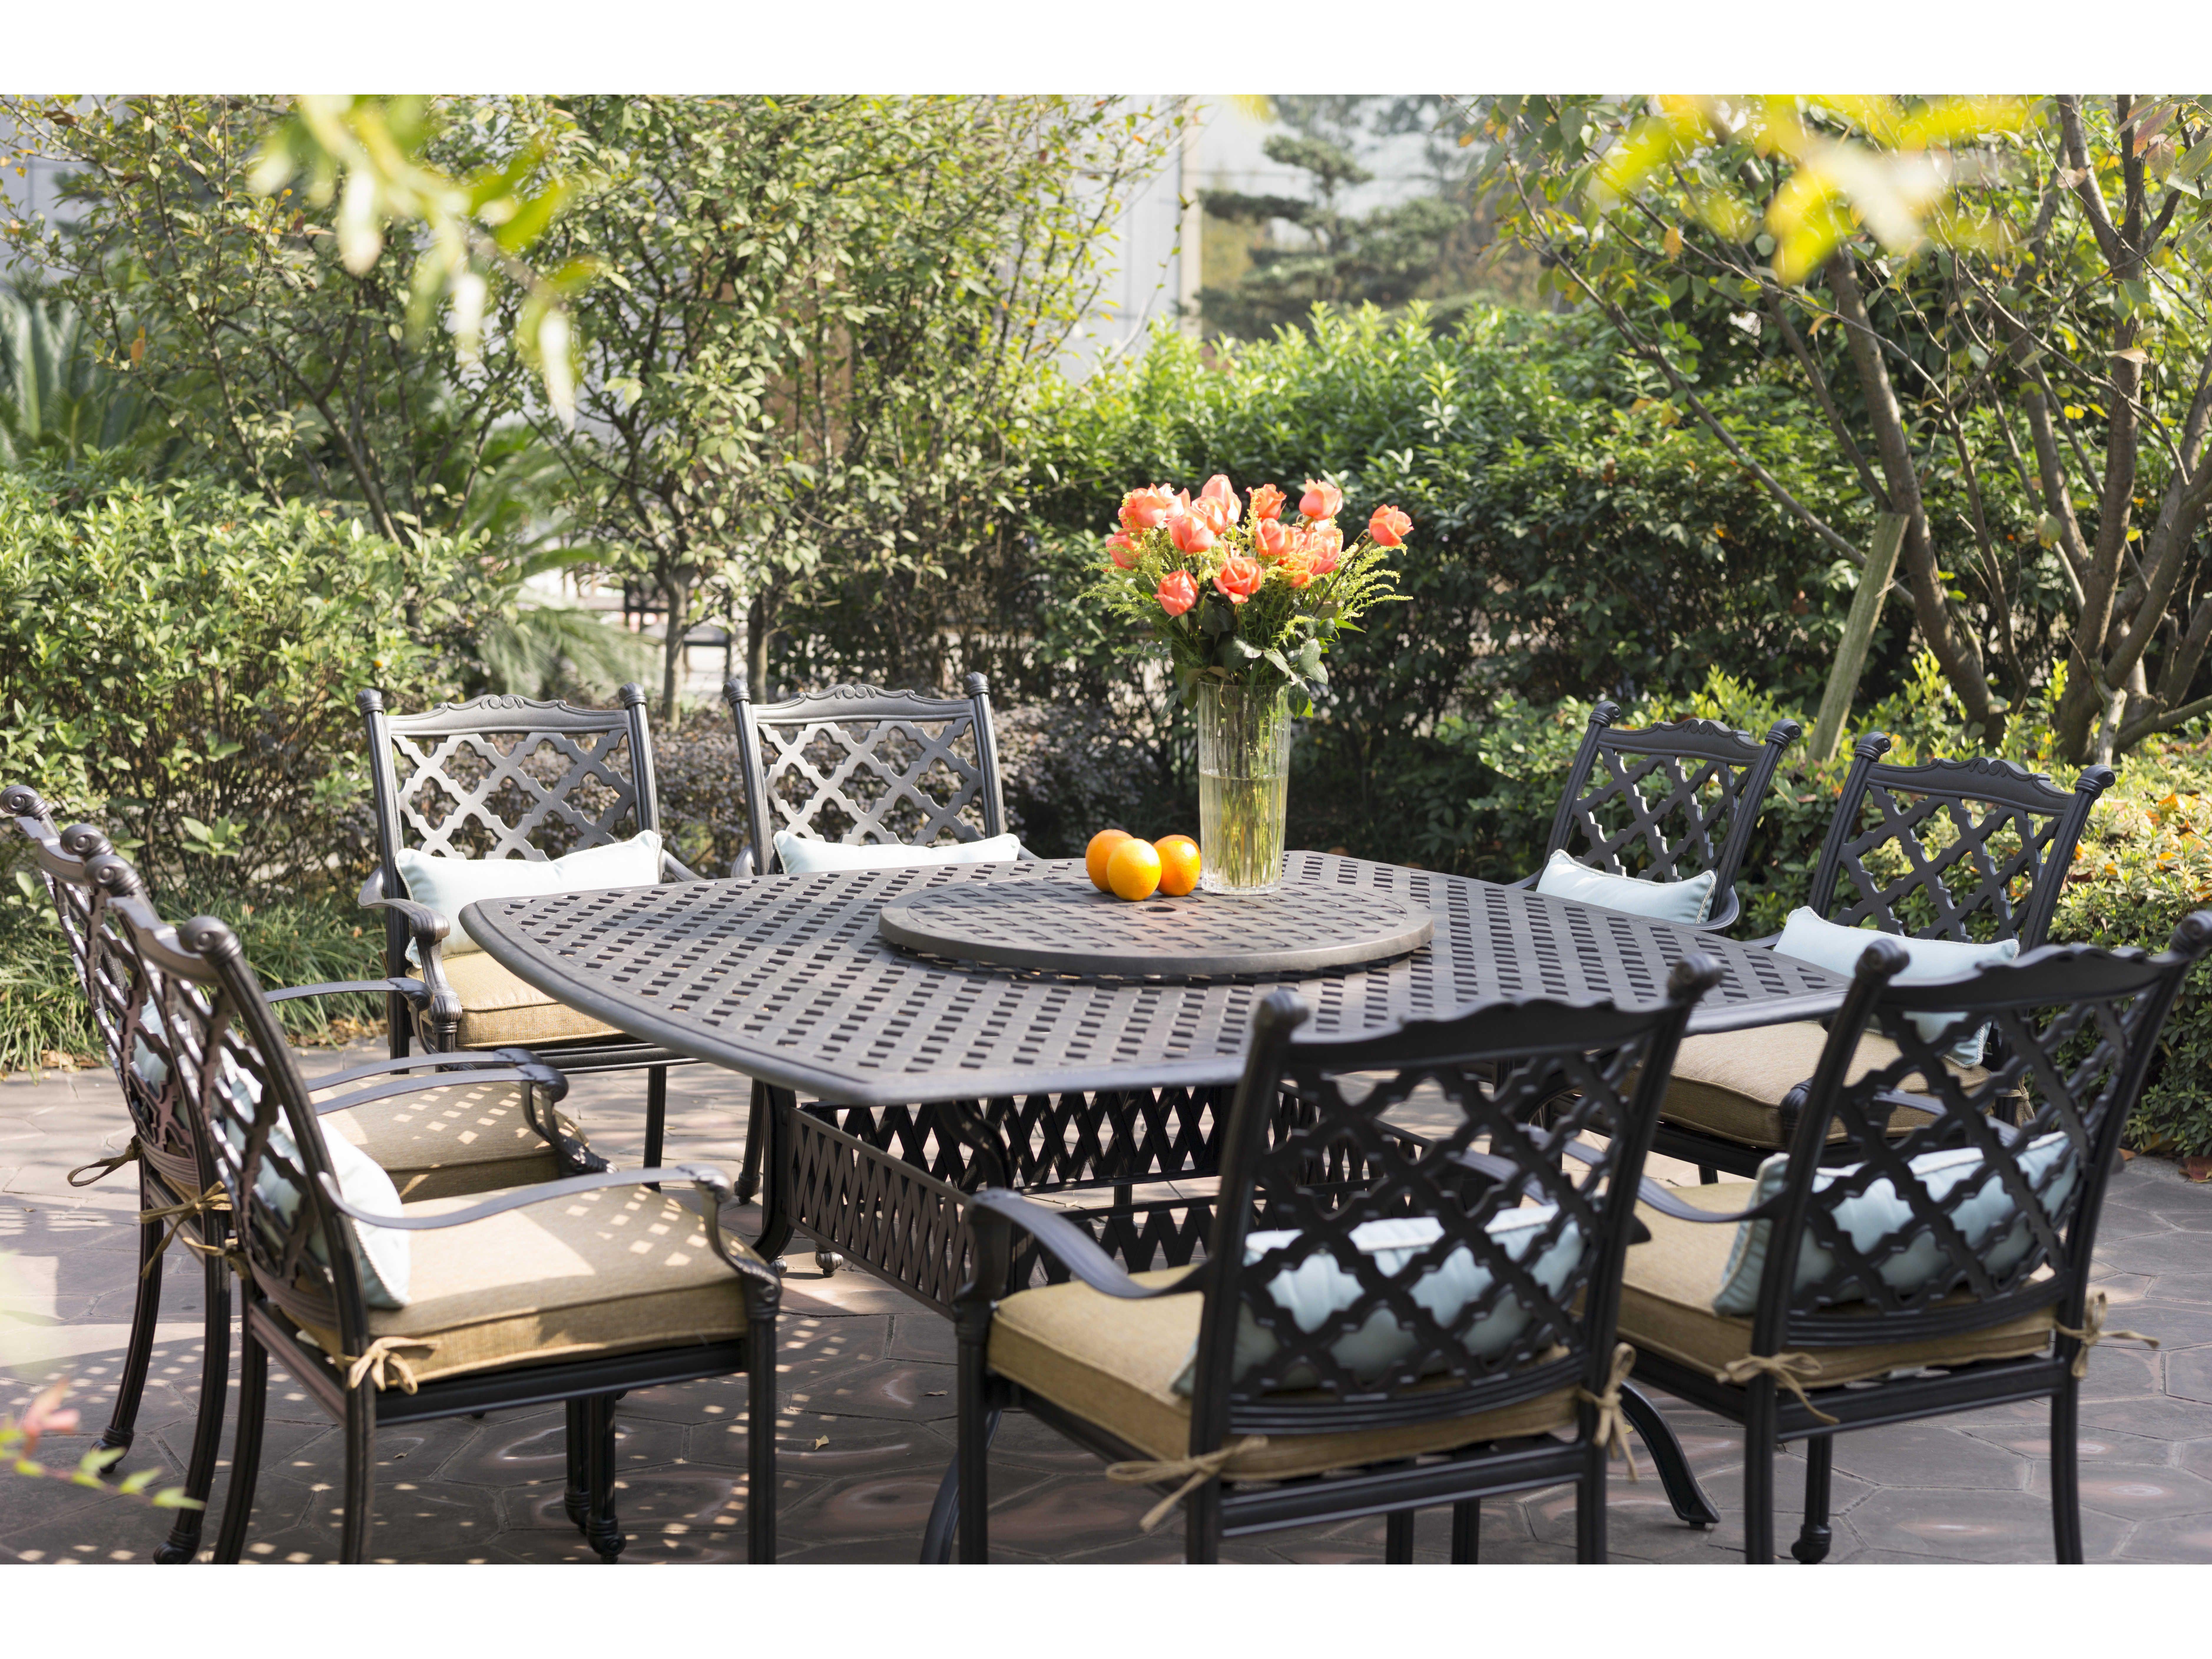 Darlee Outdoor Living Casual Cushion Cast Aluminum Dining Set Caminoreal Seta Nonstock